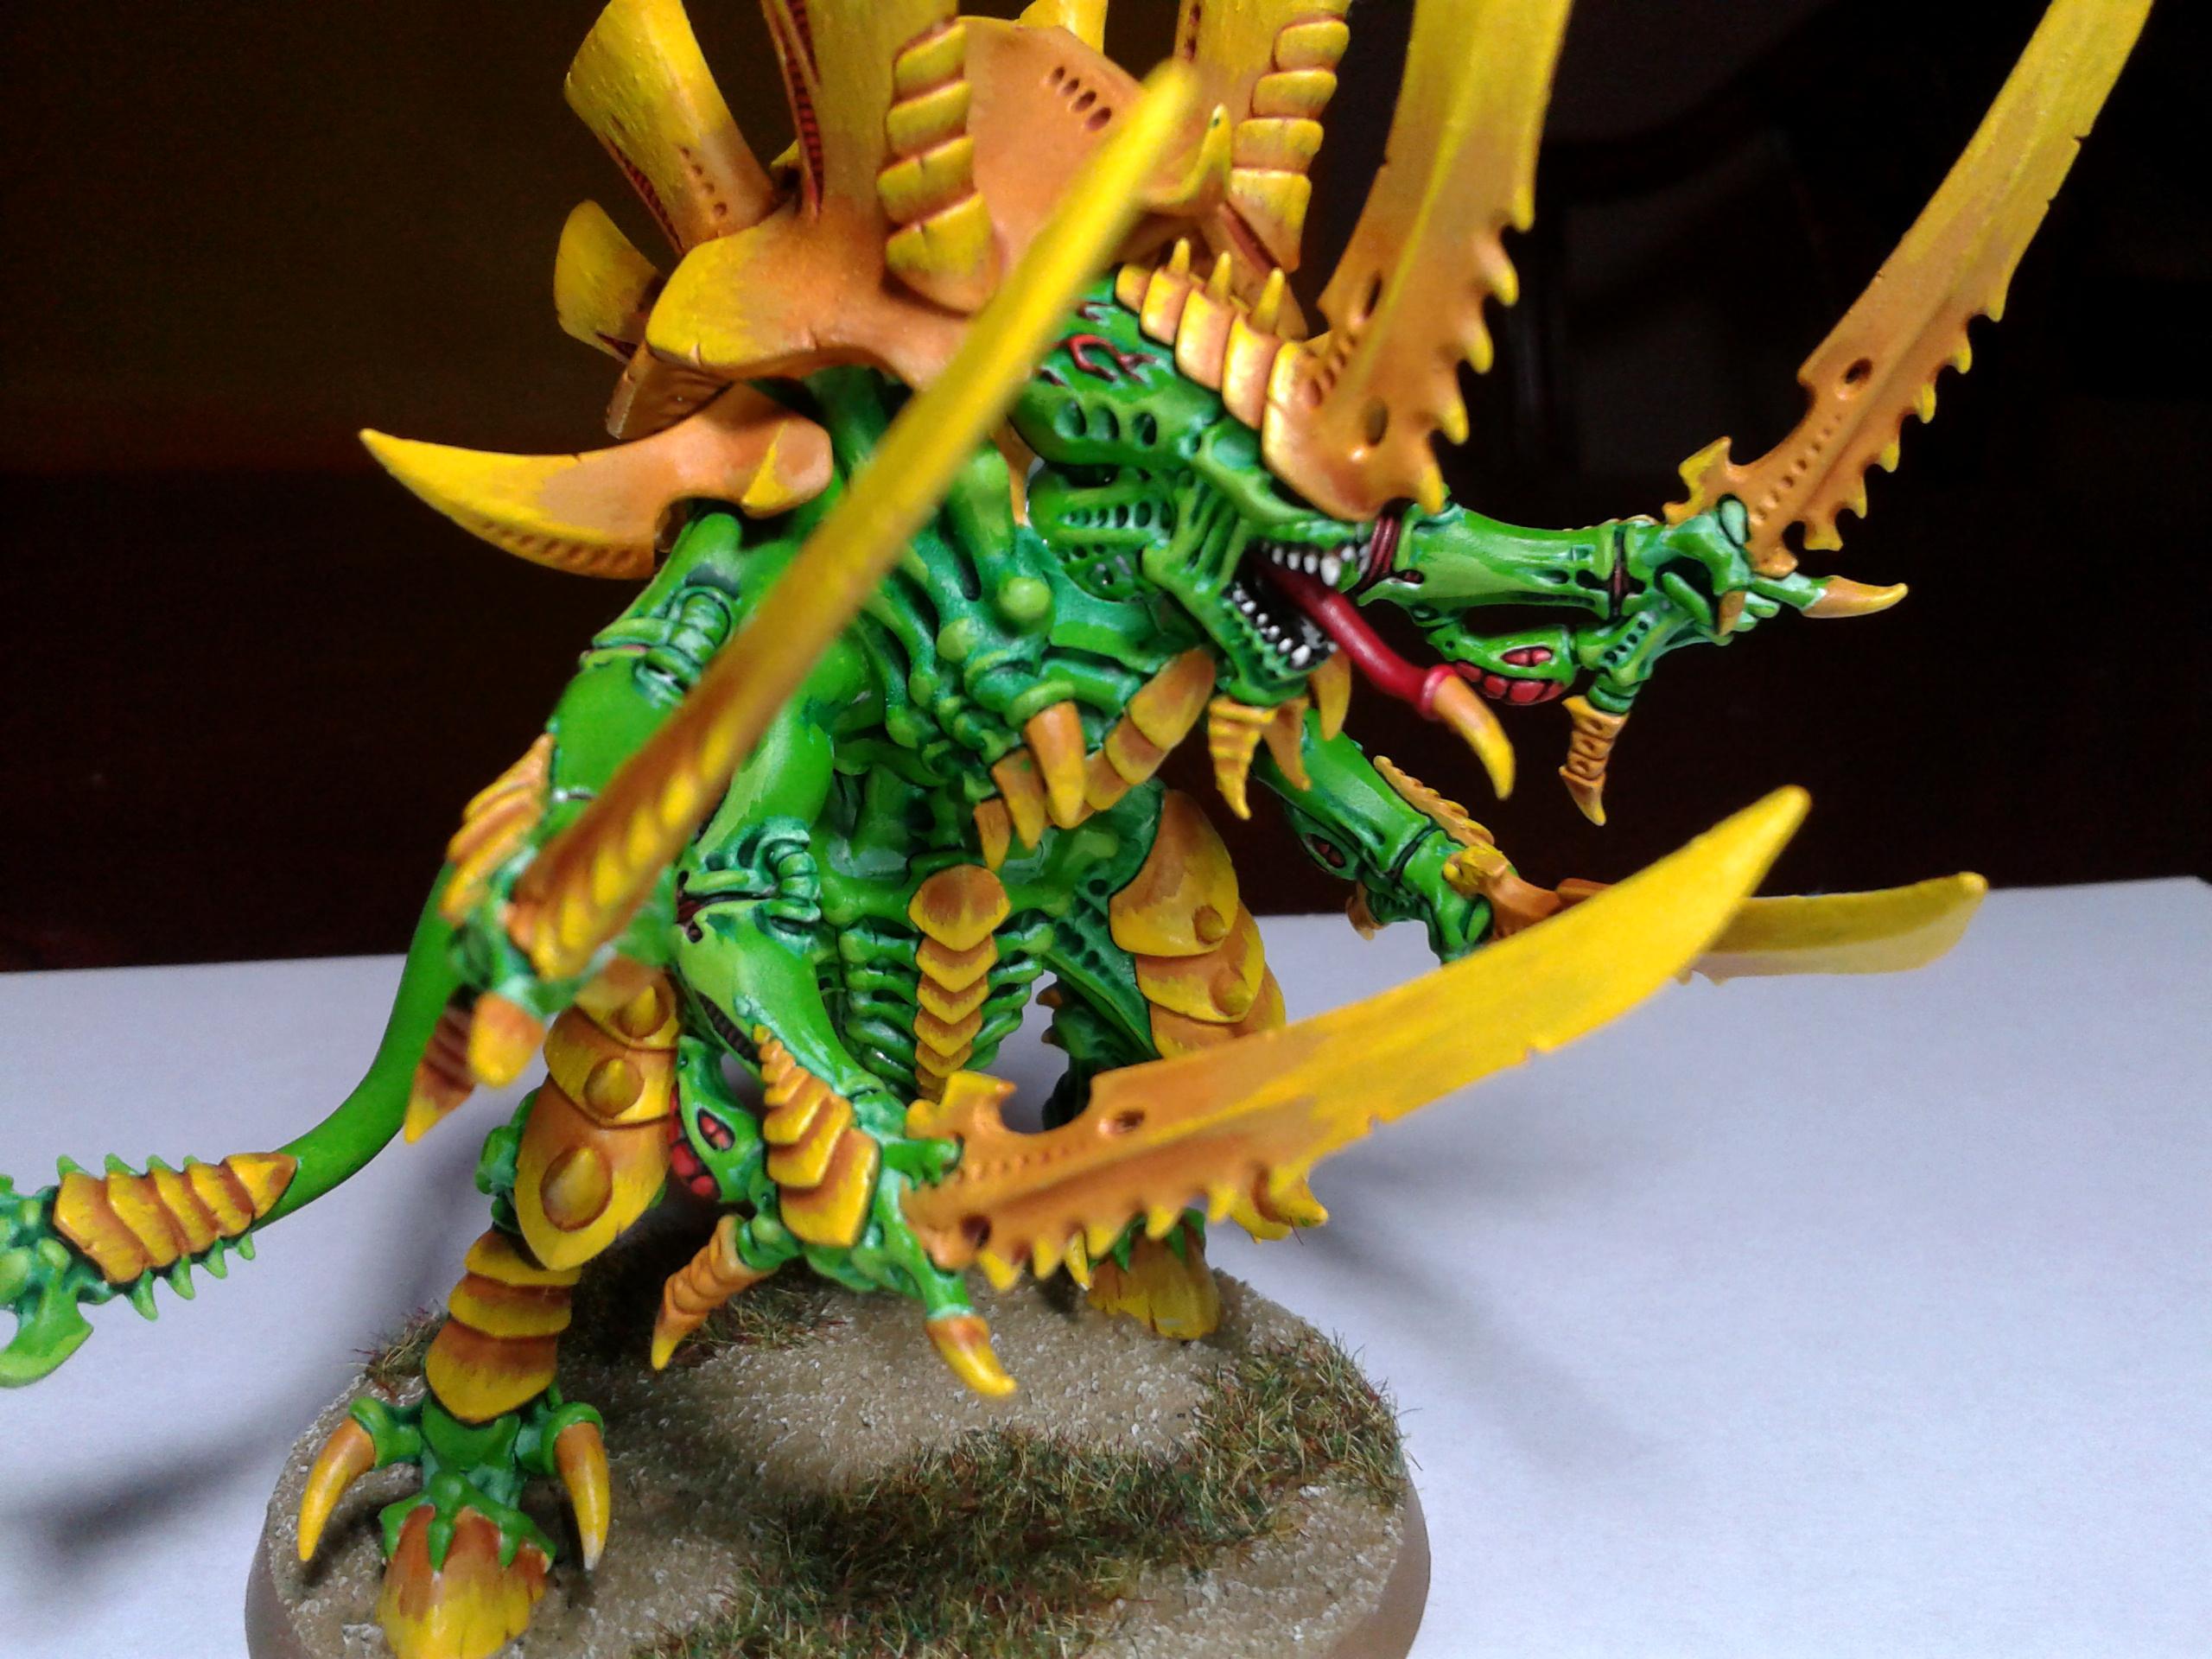 Green, Swarmlord, Tty, Tyranids, Yellow